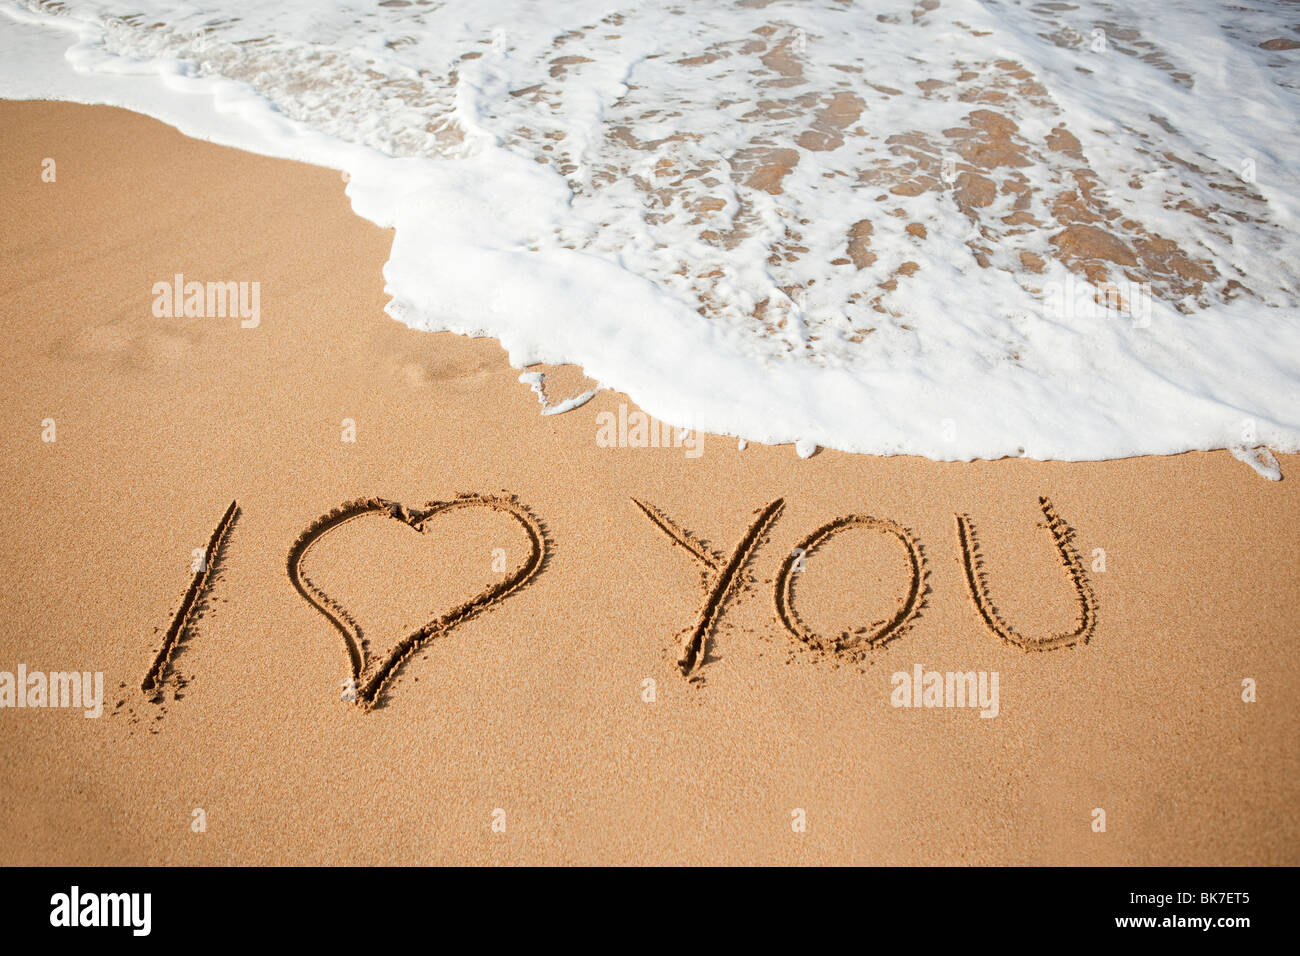 I Love You Imágenes De Stock & I Love You Fotos De Stock